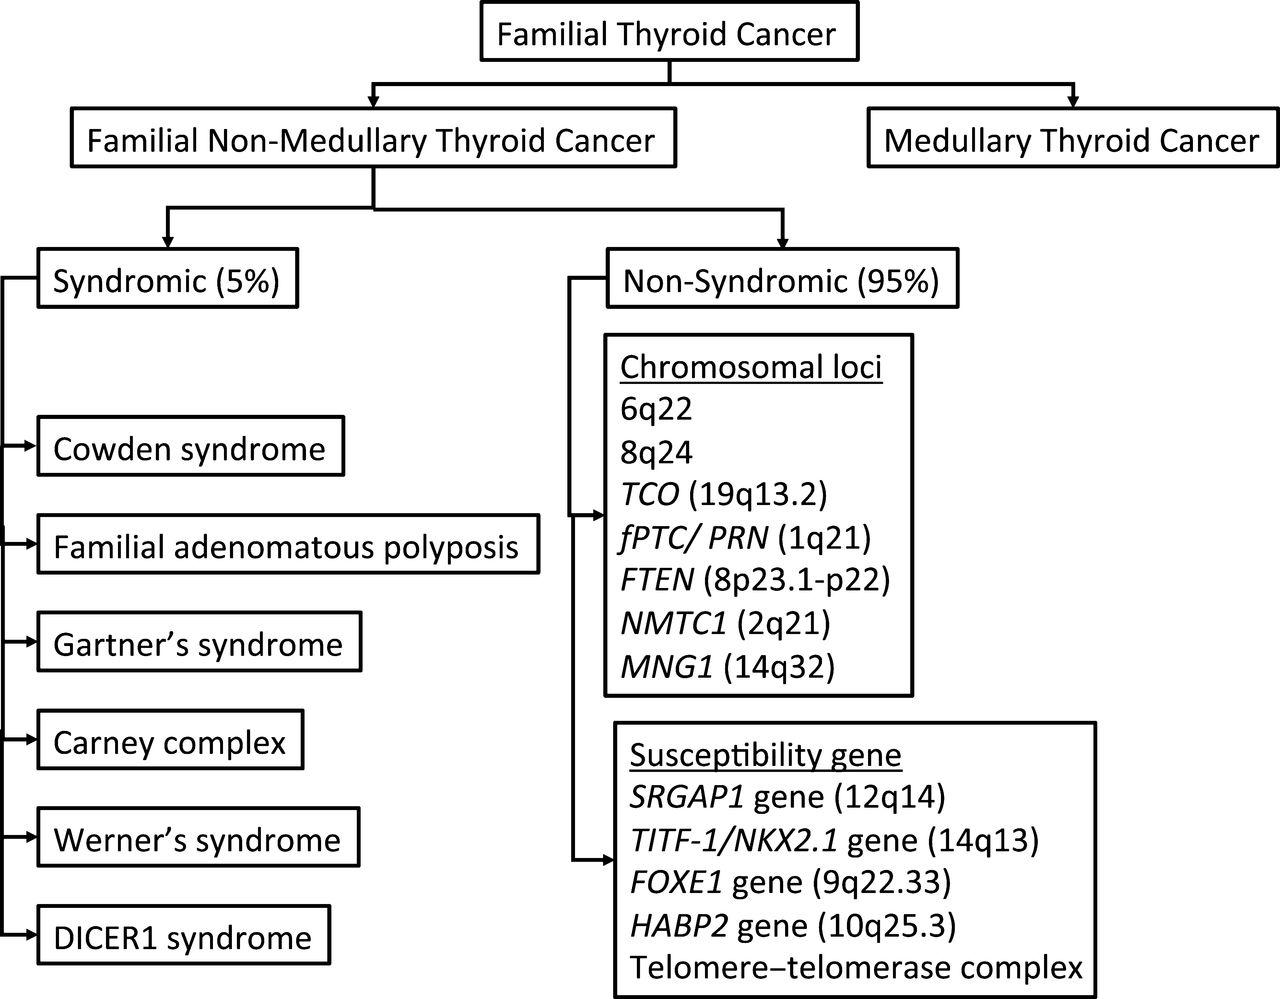 cancer non-familial